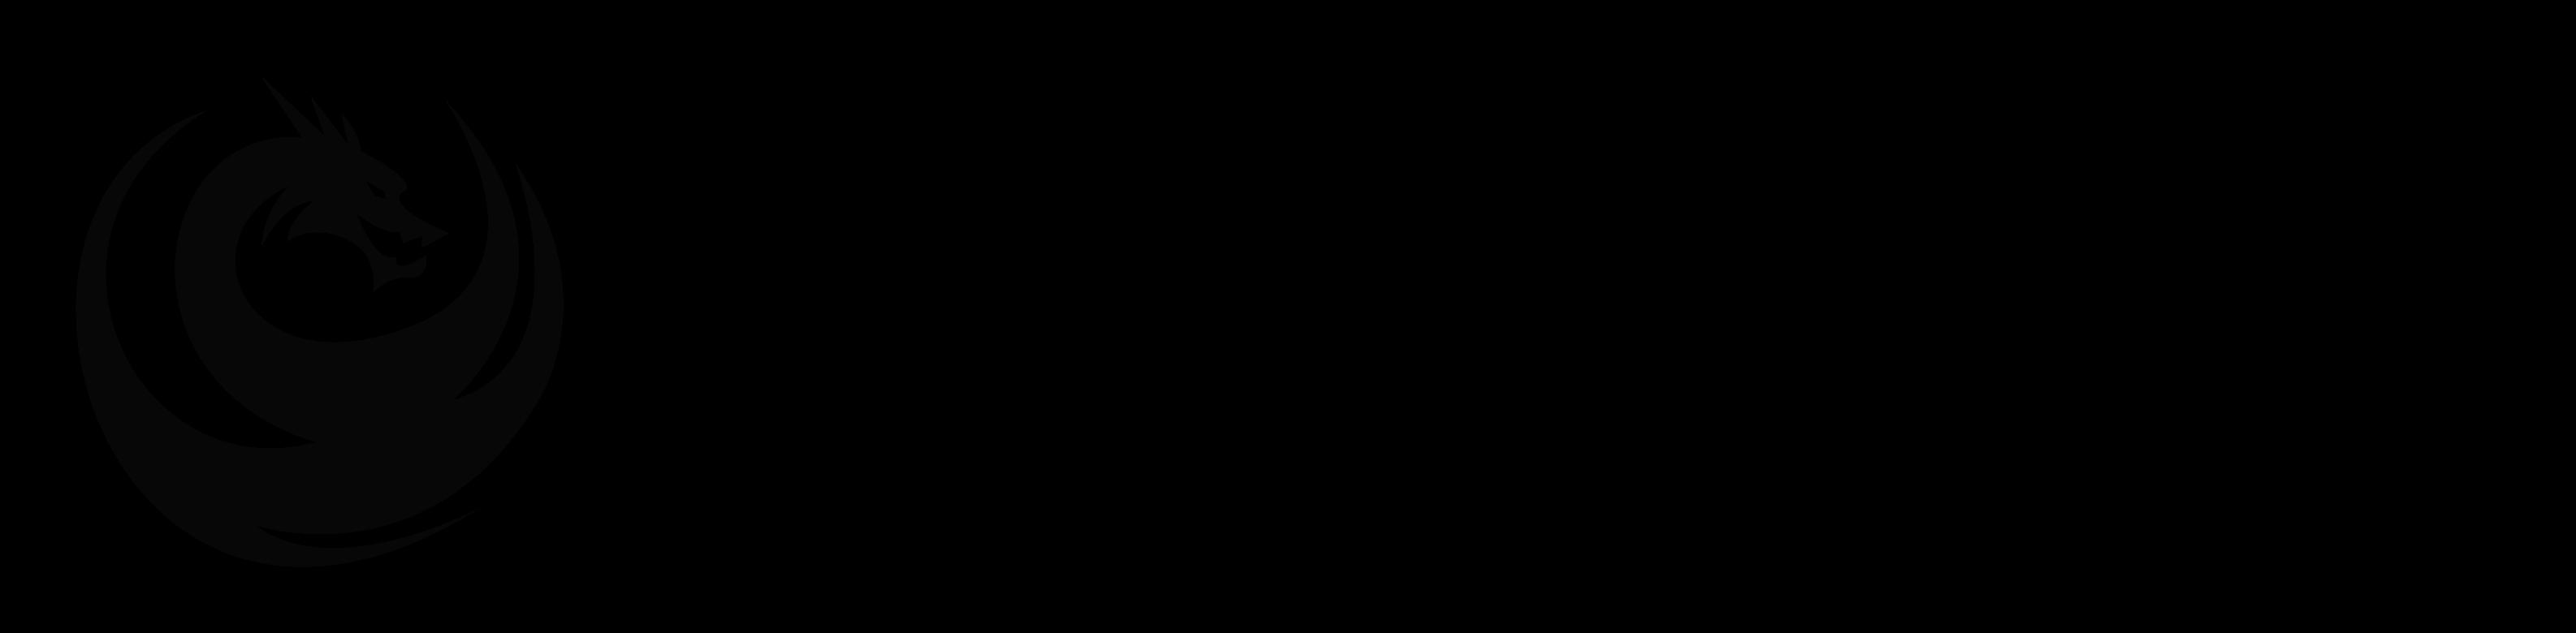 Cost ivermectin